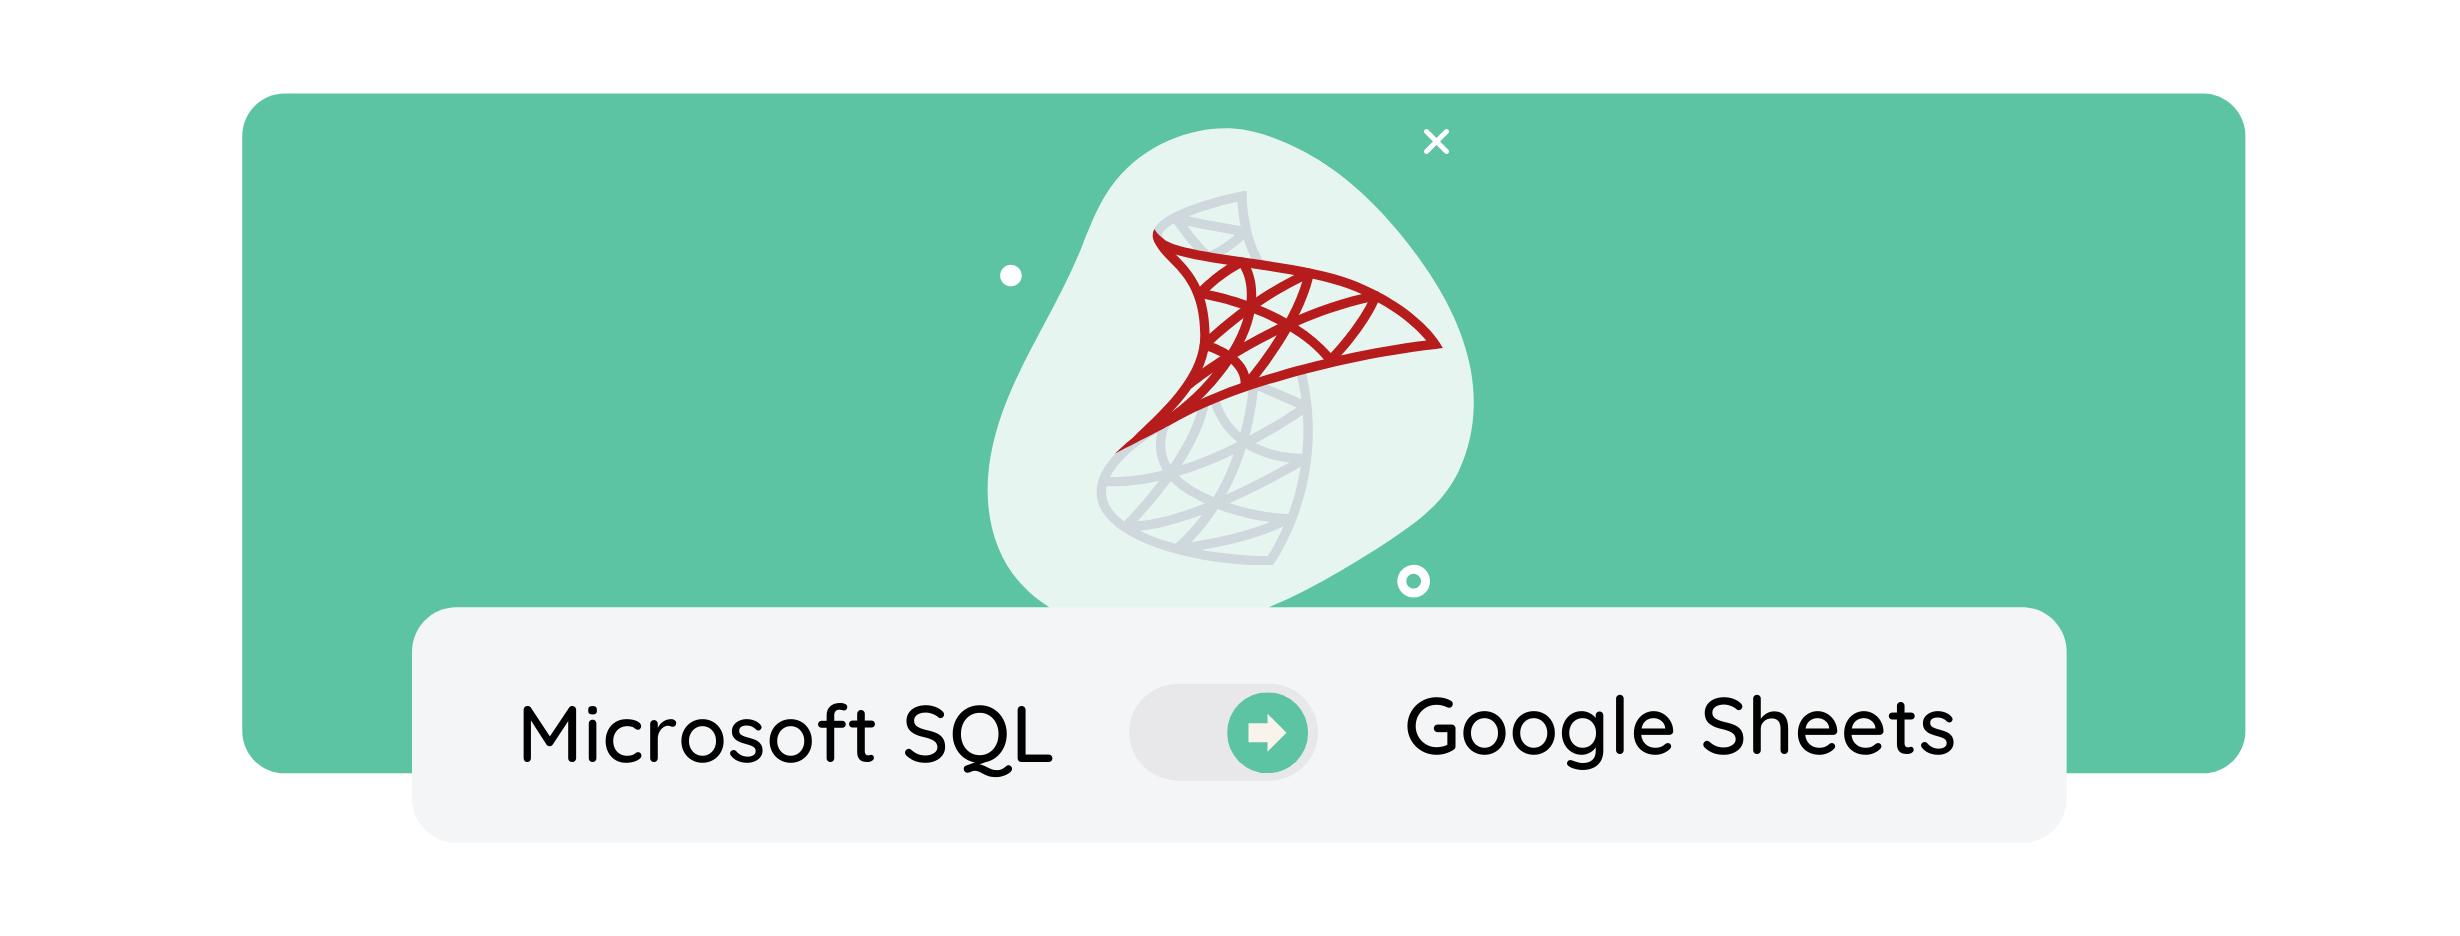 Microsoft SQL Server Connector